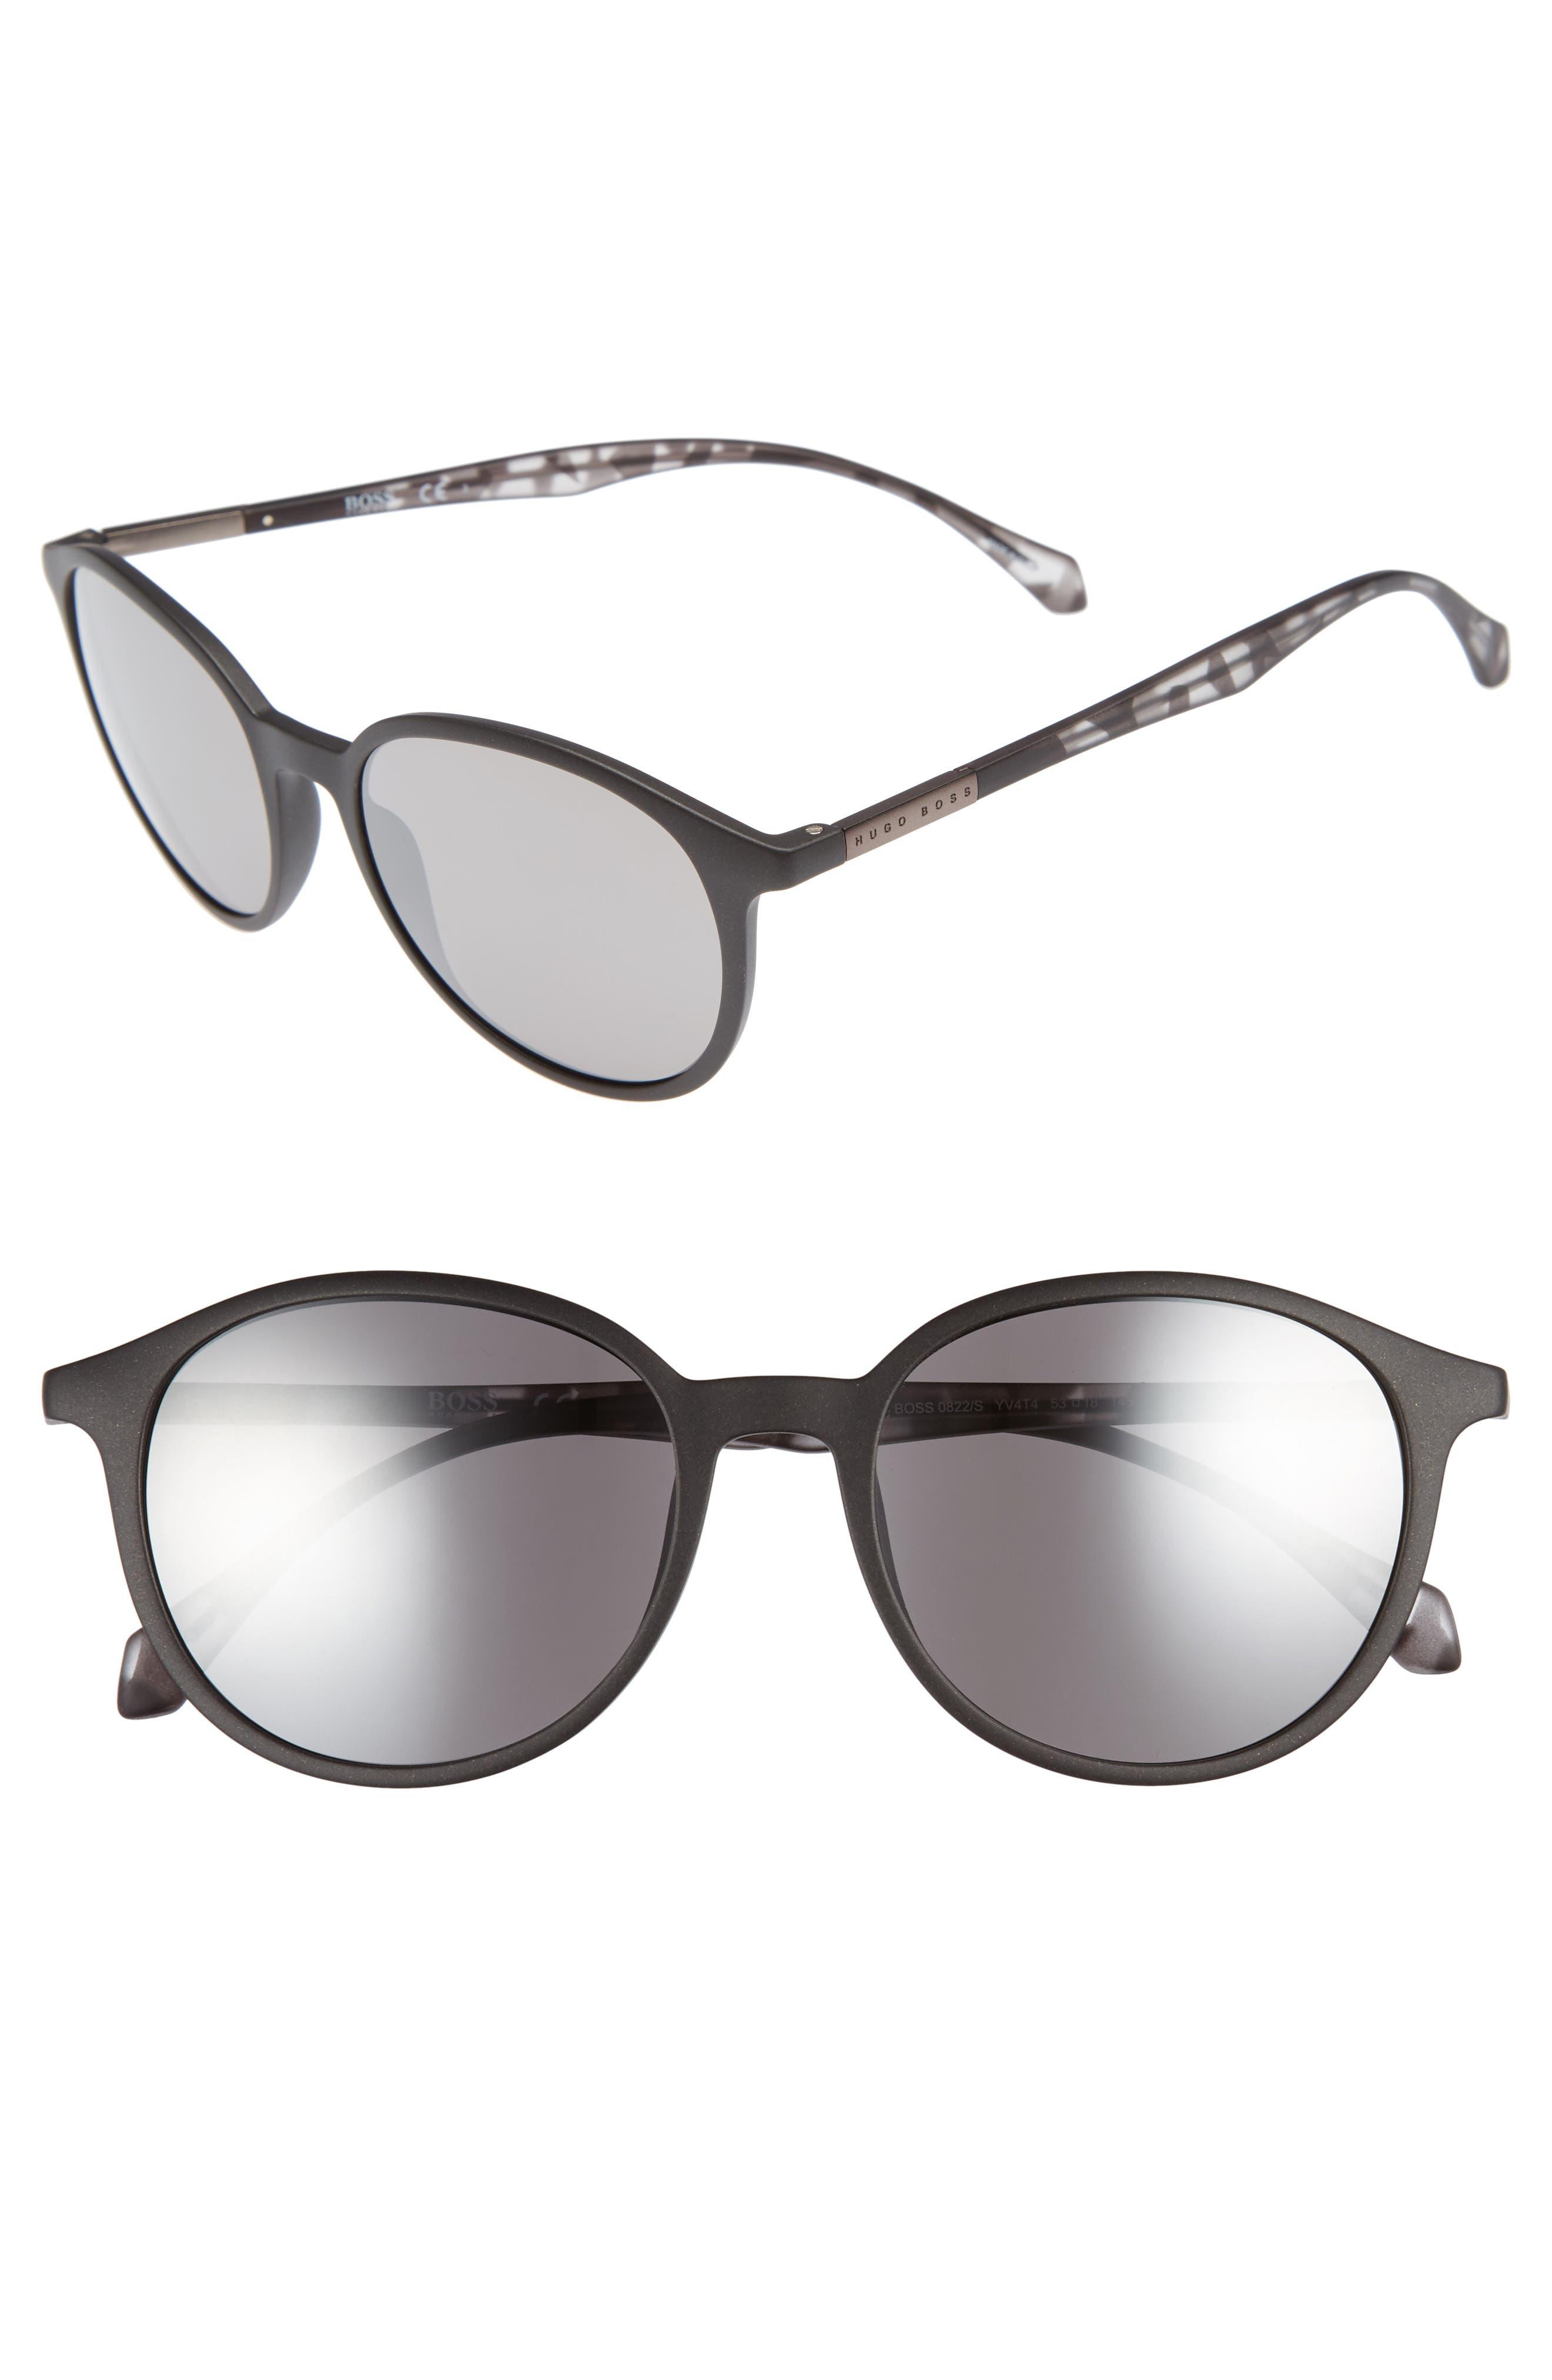 53mm Sunglasses,                             Main thumbnail 1, color,                             002